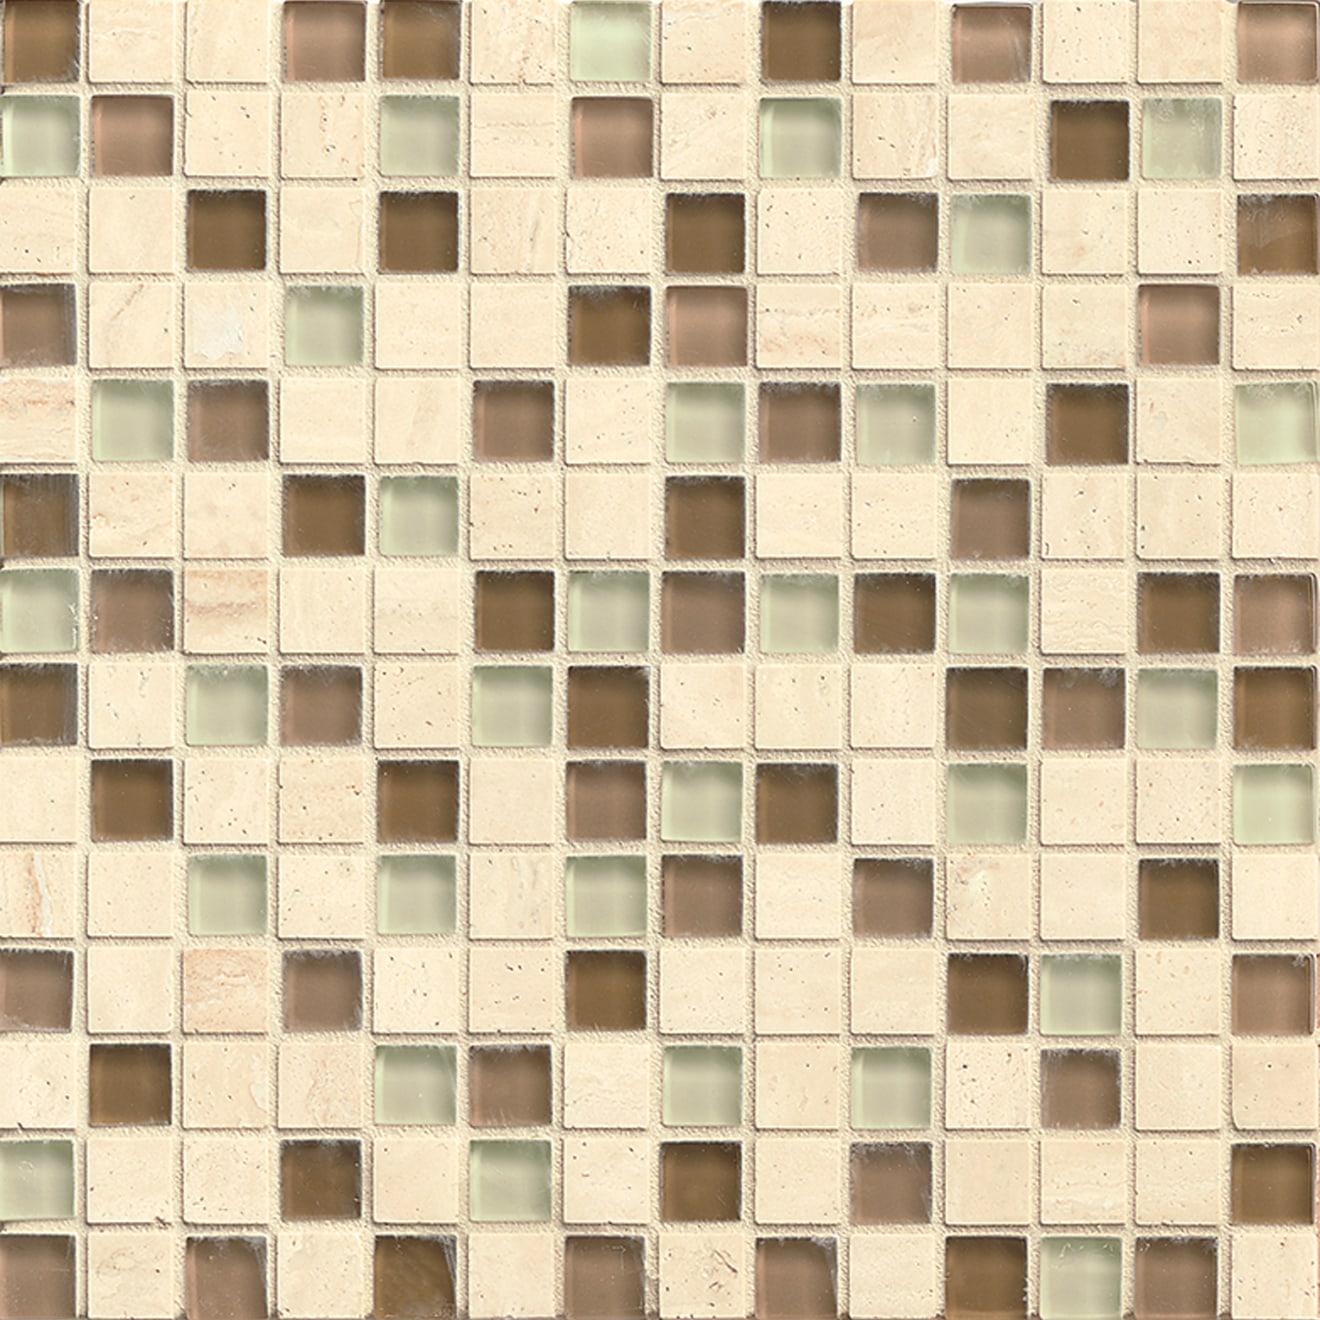 "Interlude 3/4"" x 3/4"" Wall Mosaic in Treble"